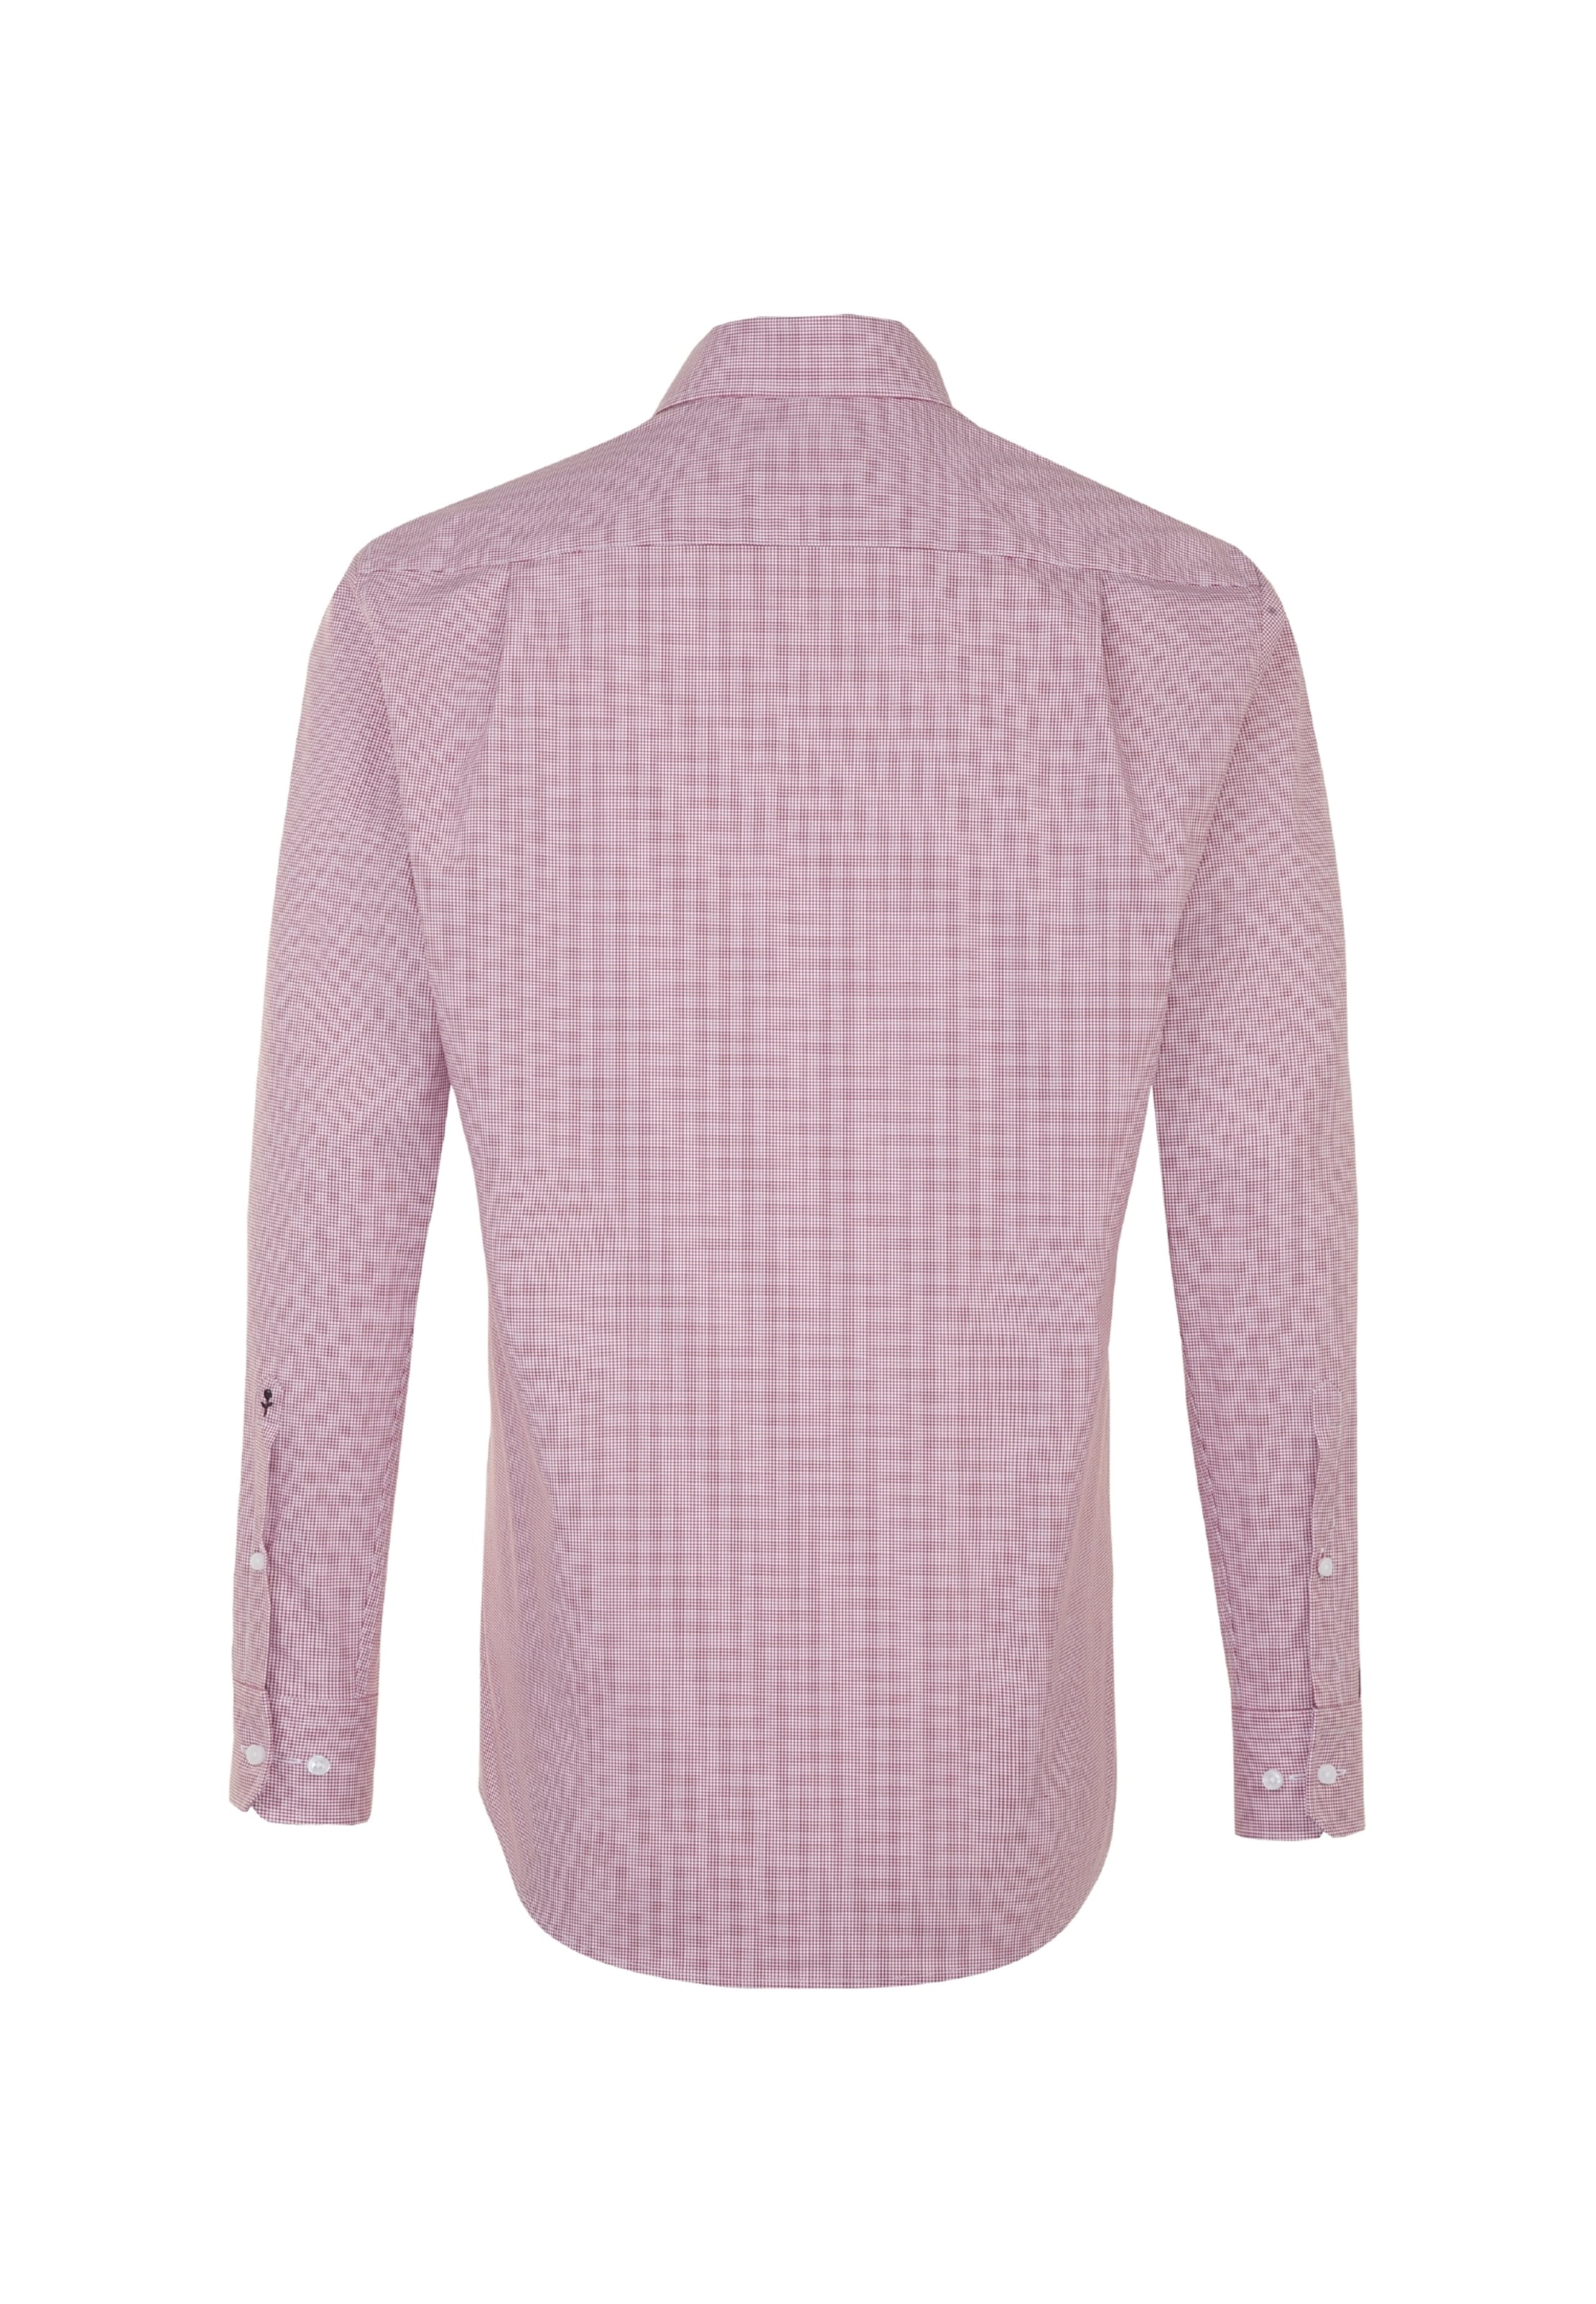 'modern' Seidensticker Seidensticker Hemd In In 'modern' Hemd RotWeiß T13lcFKJ